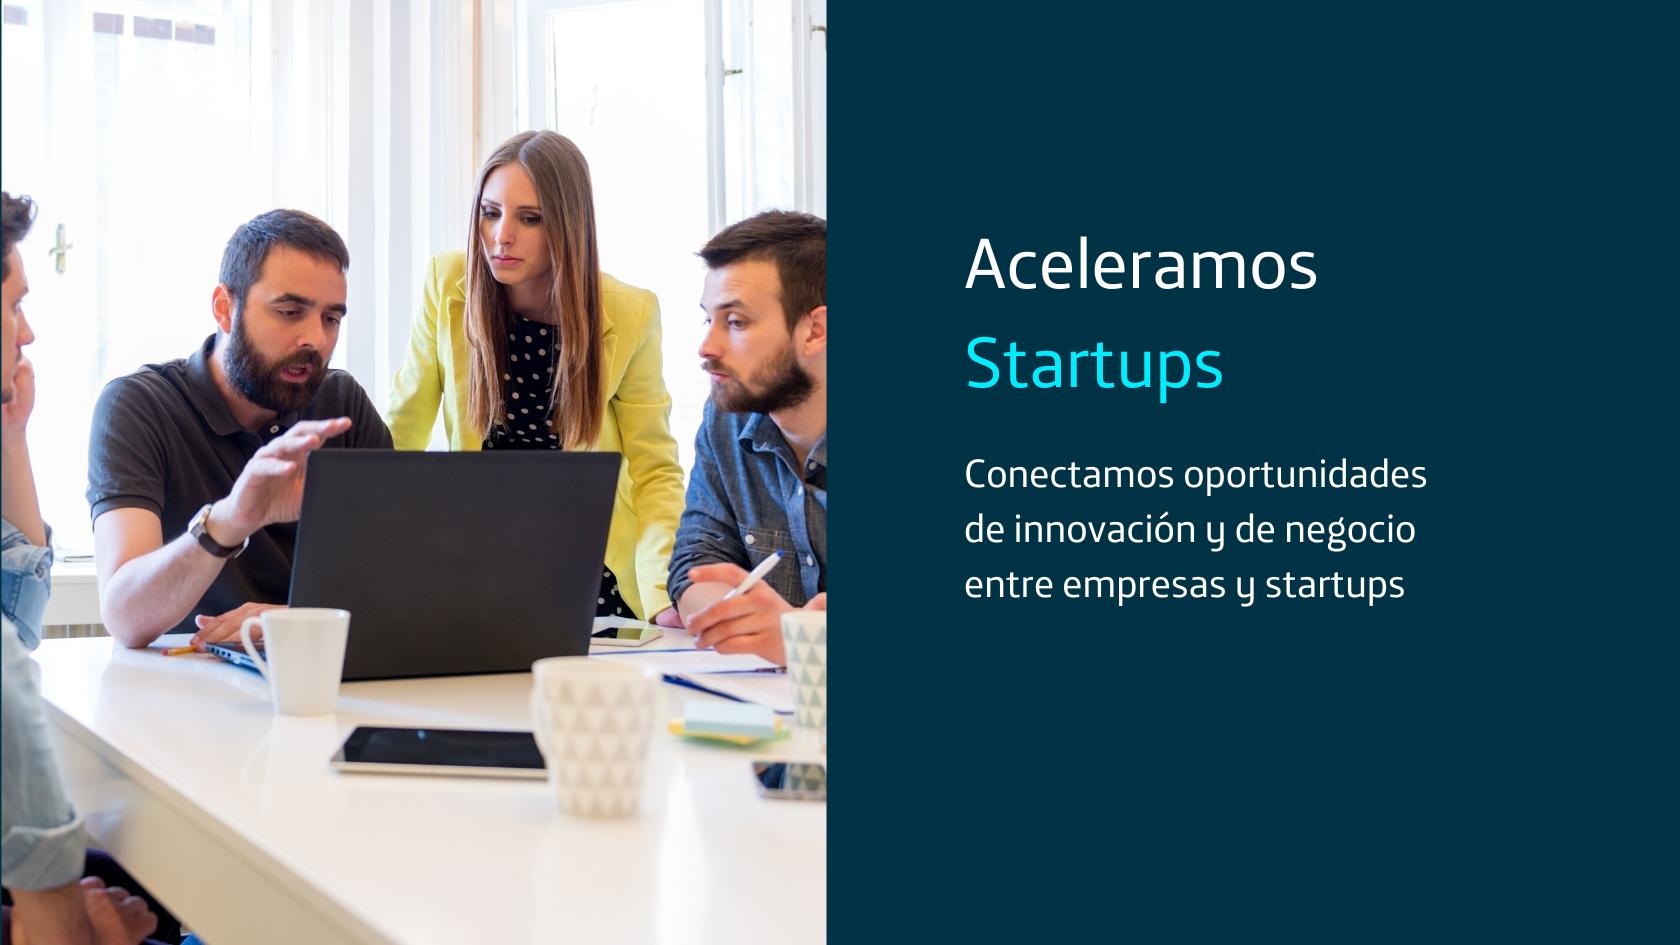 Aceleramos startups